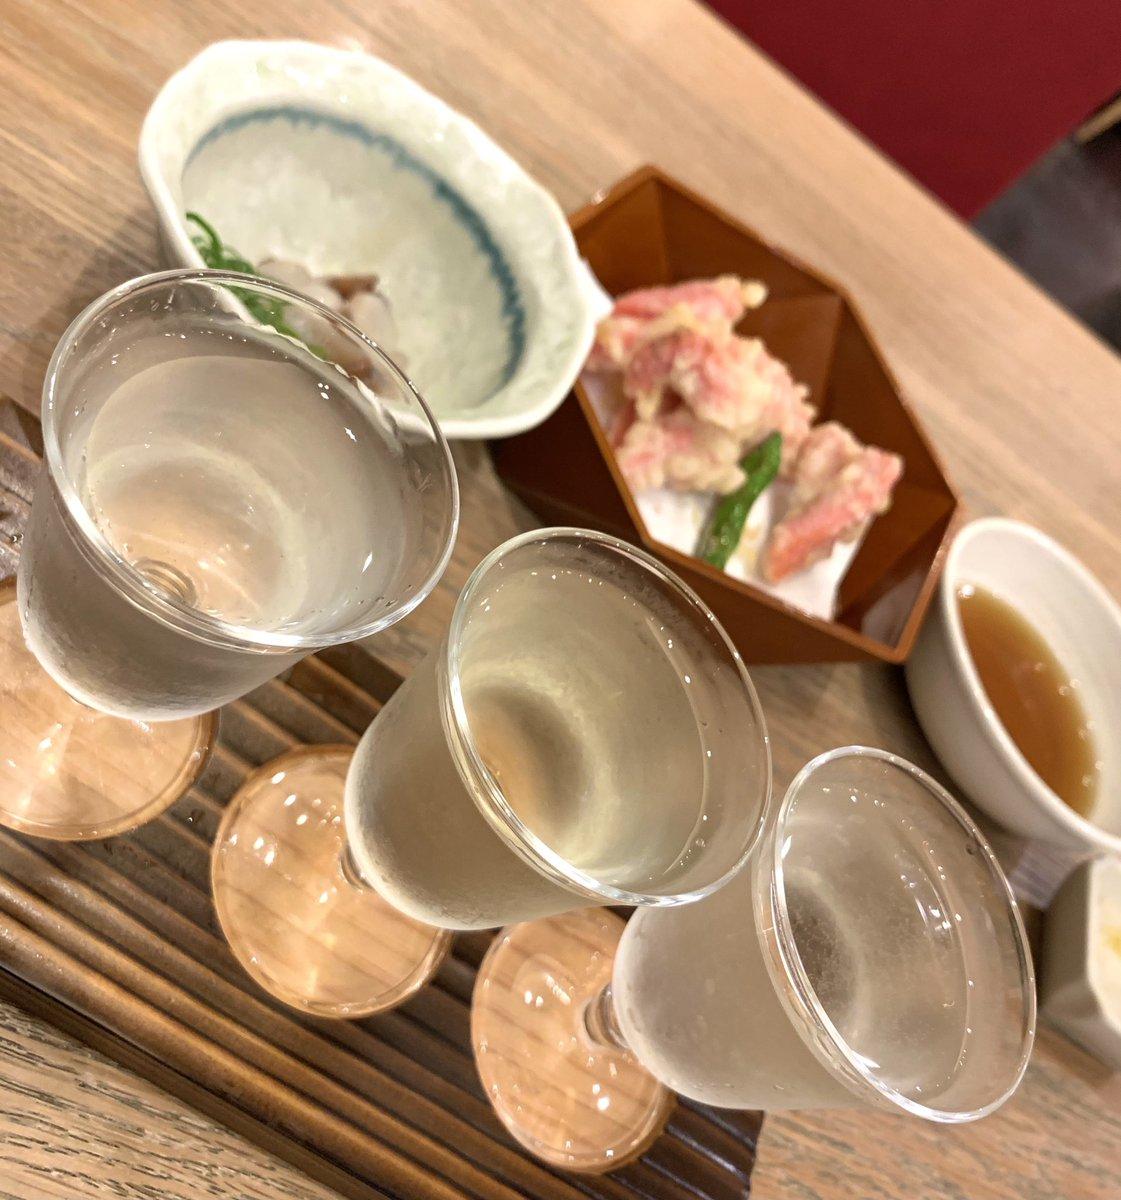 test ツイッターメディア - 蕎旬にて日本酒の飲み比べ。 左は新潟の緑川。さっぱり辛口。 真ん中は、新潟の越後鶴亀。ワイン酵母仕込みらしい良い酸味。 右は奈良の風の森(秋津穂)。旨味と甘味がしっかり。 三者三様で楽しく飲み比べられます。 ツマミはたこワサと、えびちくわの天ぷら。 #日本酒 https://t.co/fzxqQNiHut